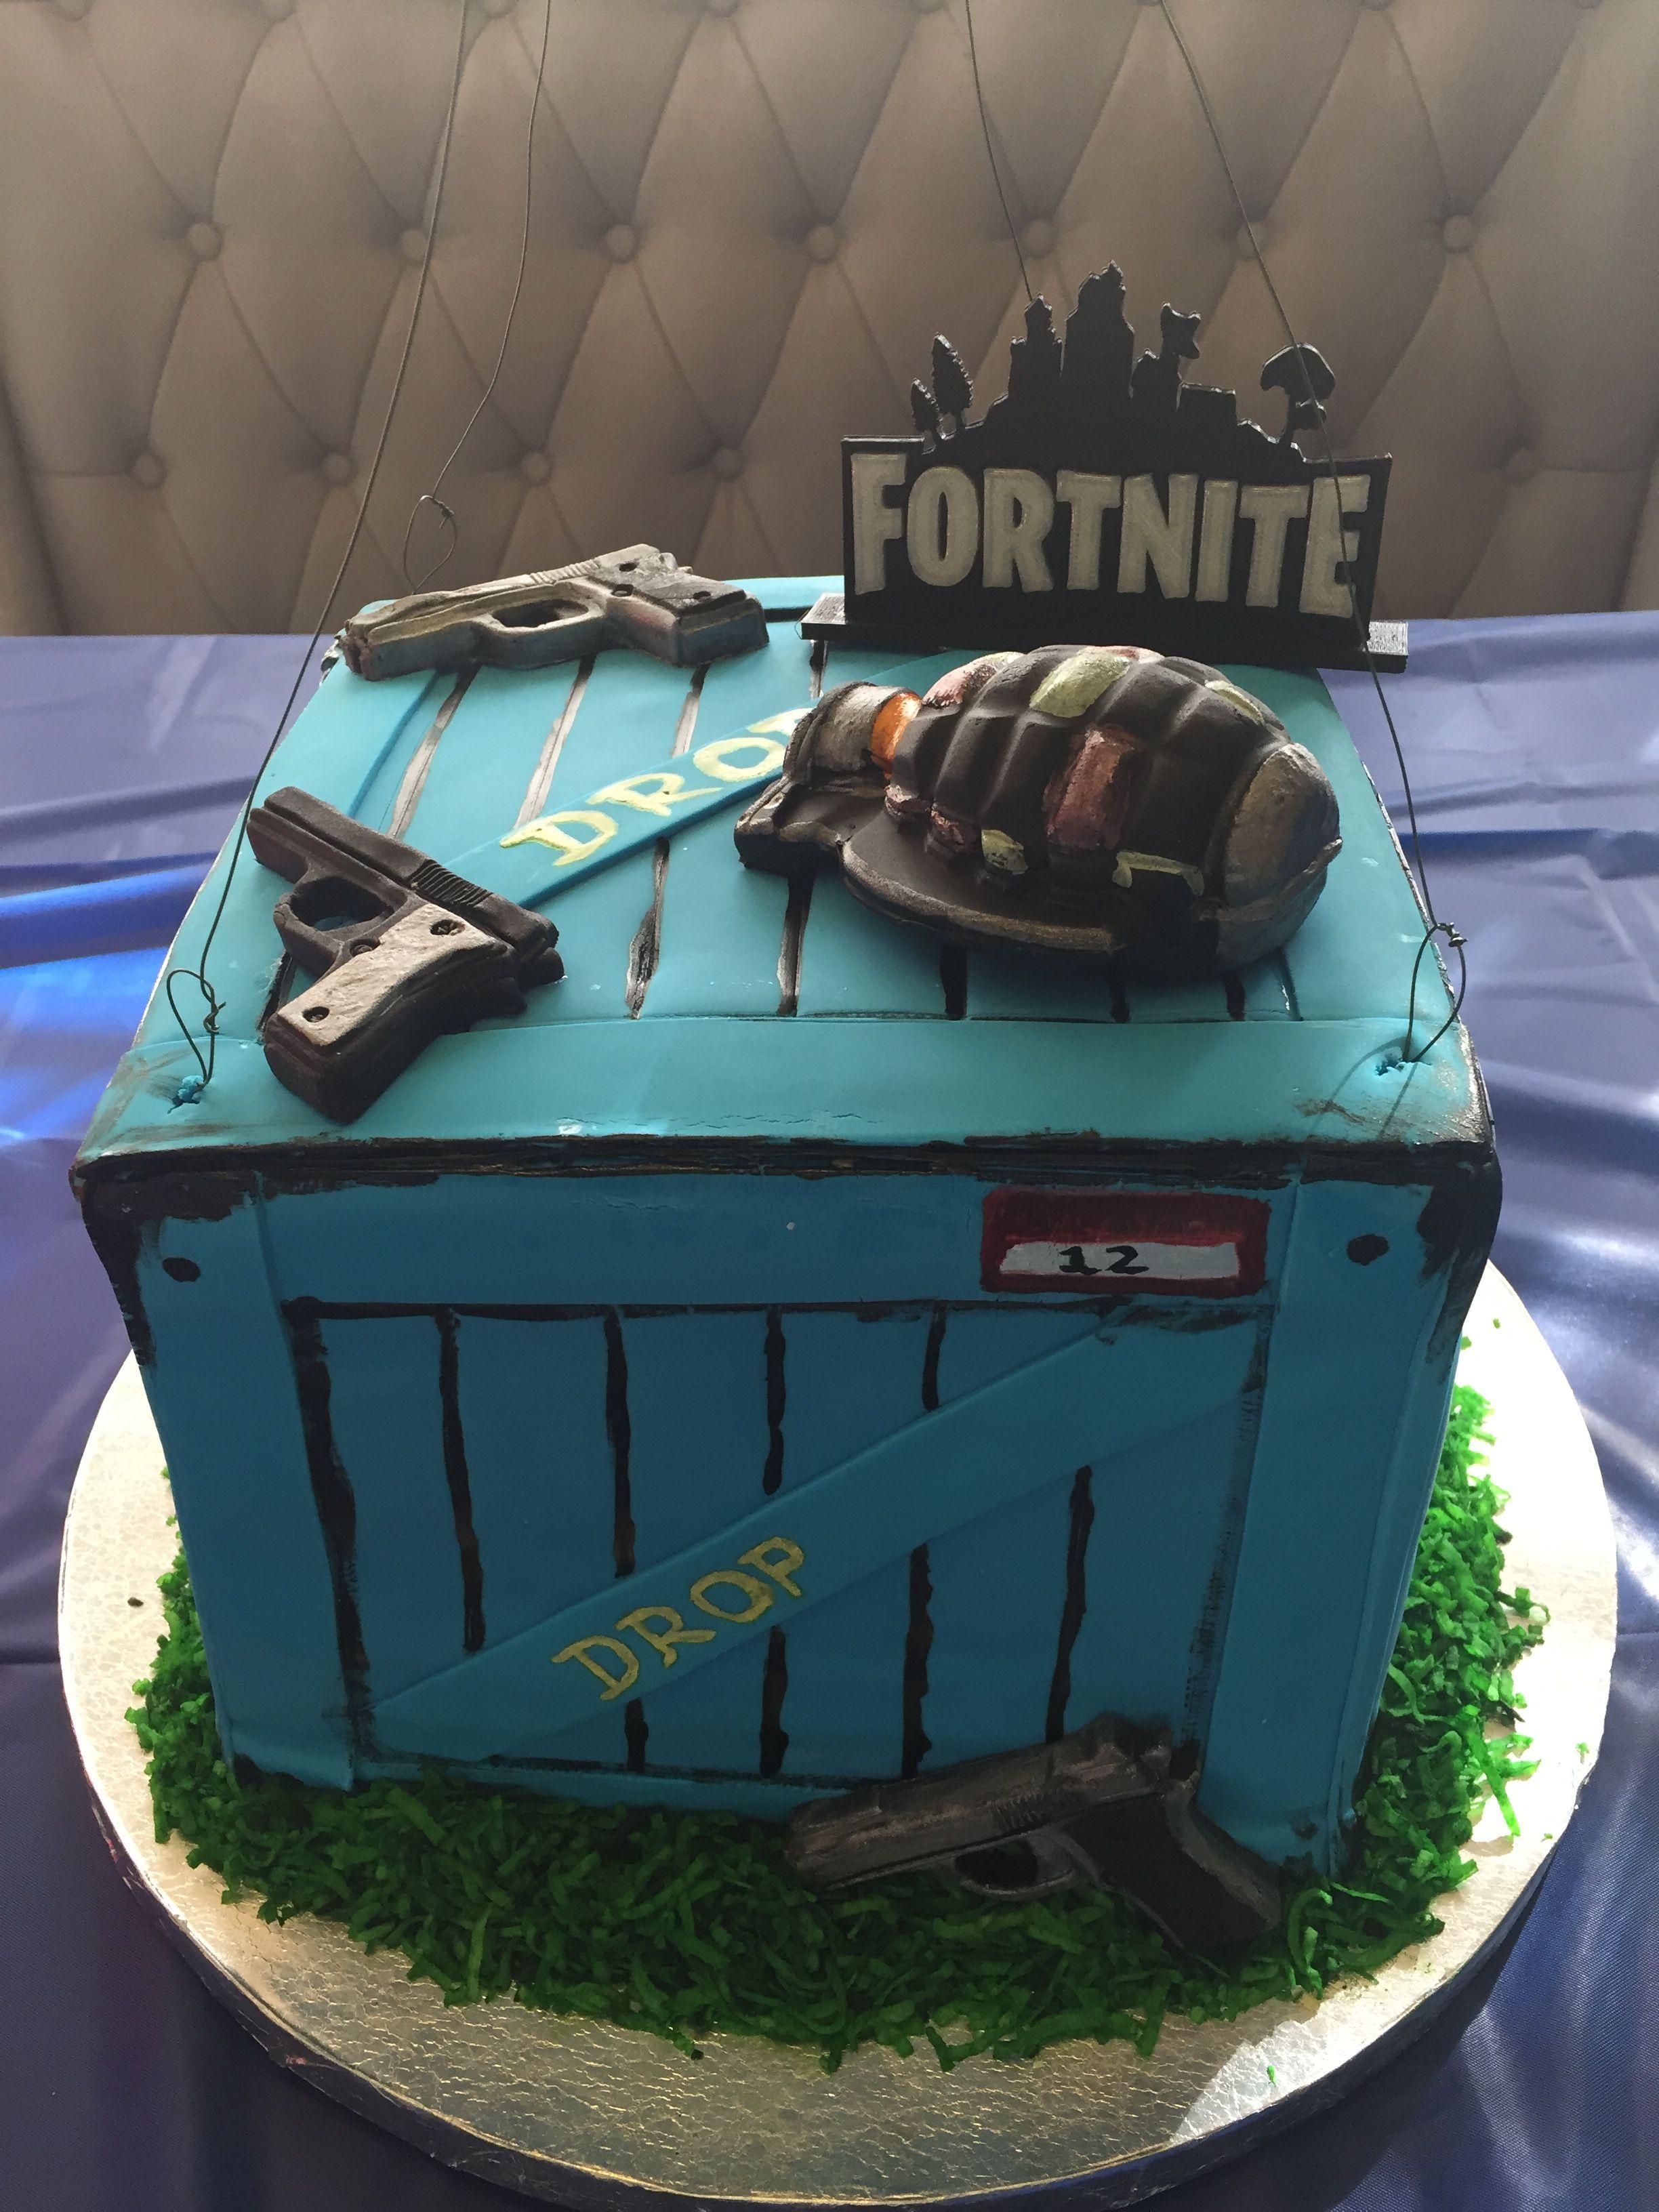 Fortnite Supply Drop Box Cake Cake Ideas In 2019